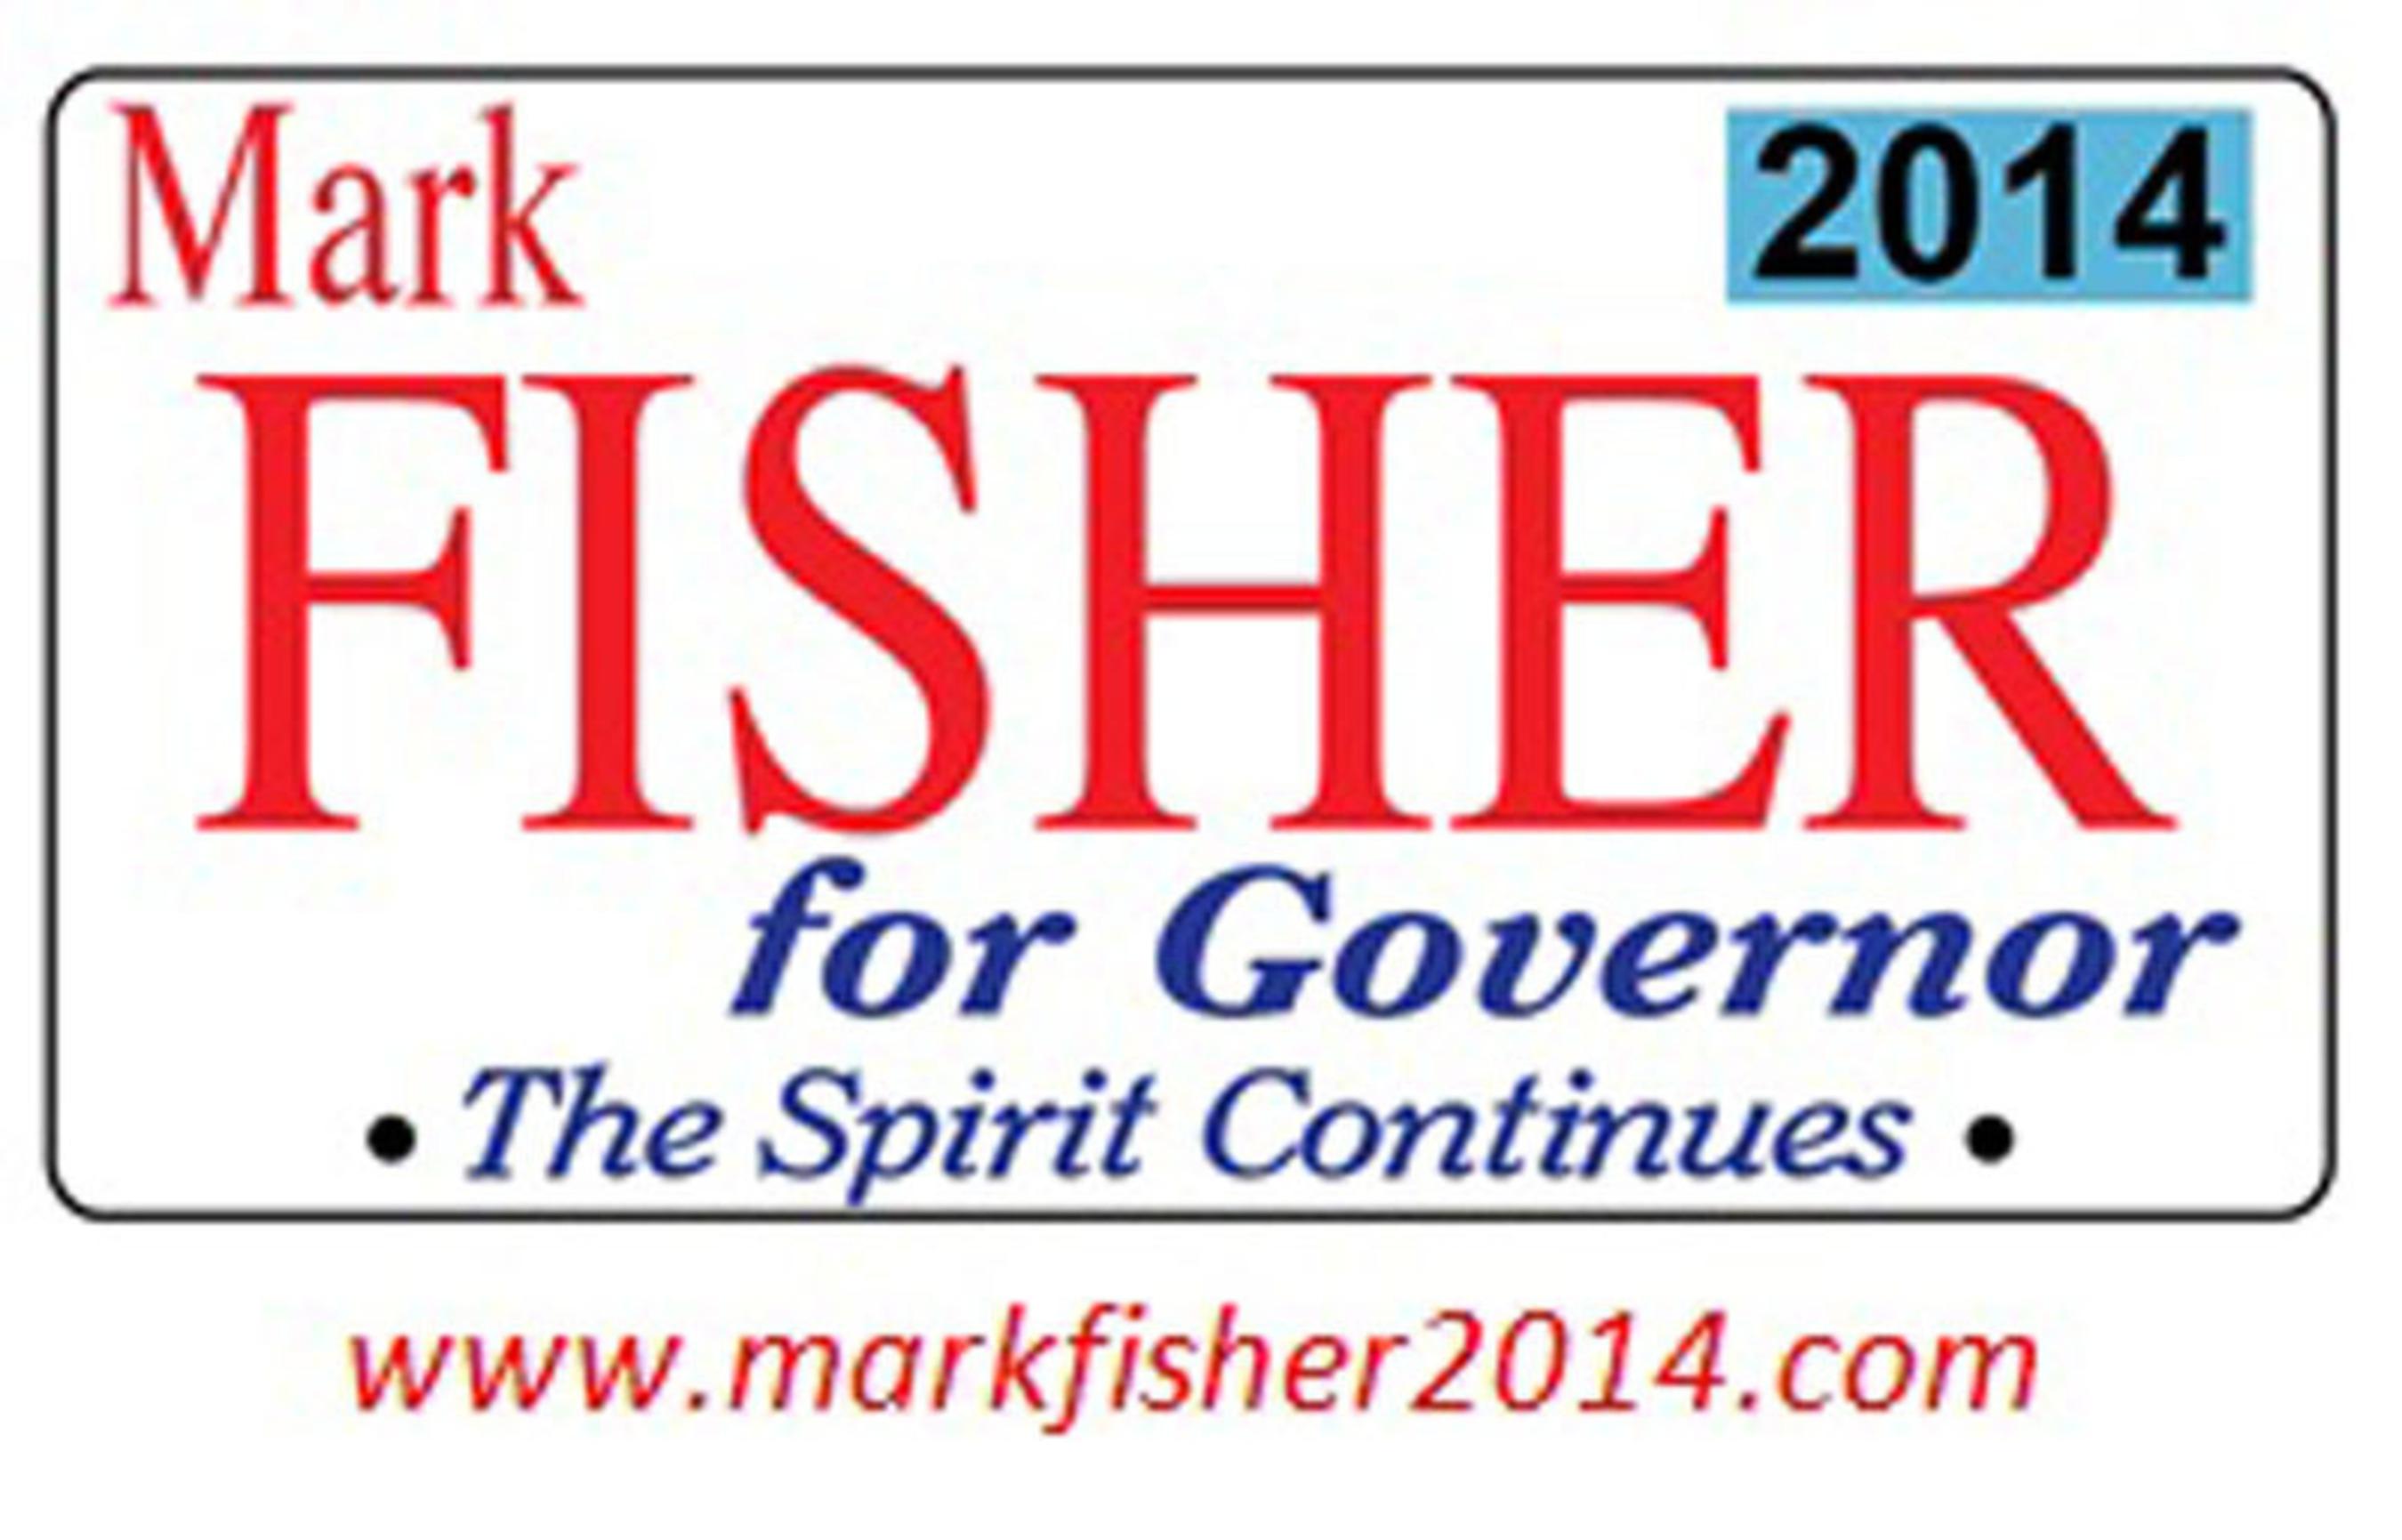 Mark Fisher for Governor 2014 image.  (PRNewsFoto/Mark Fisher for Governor)